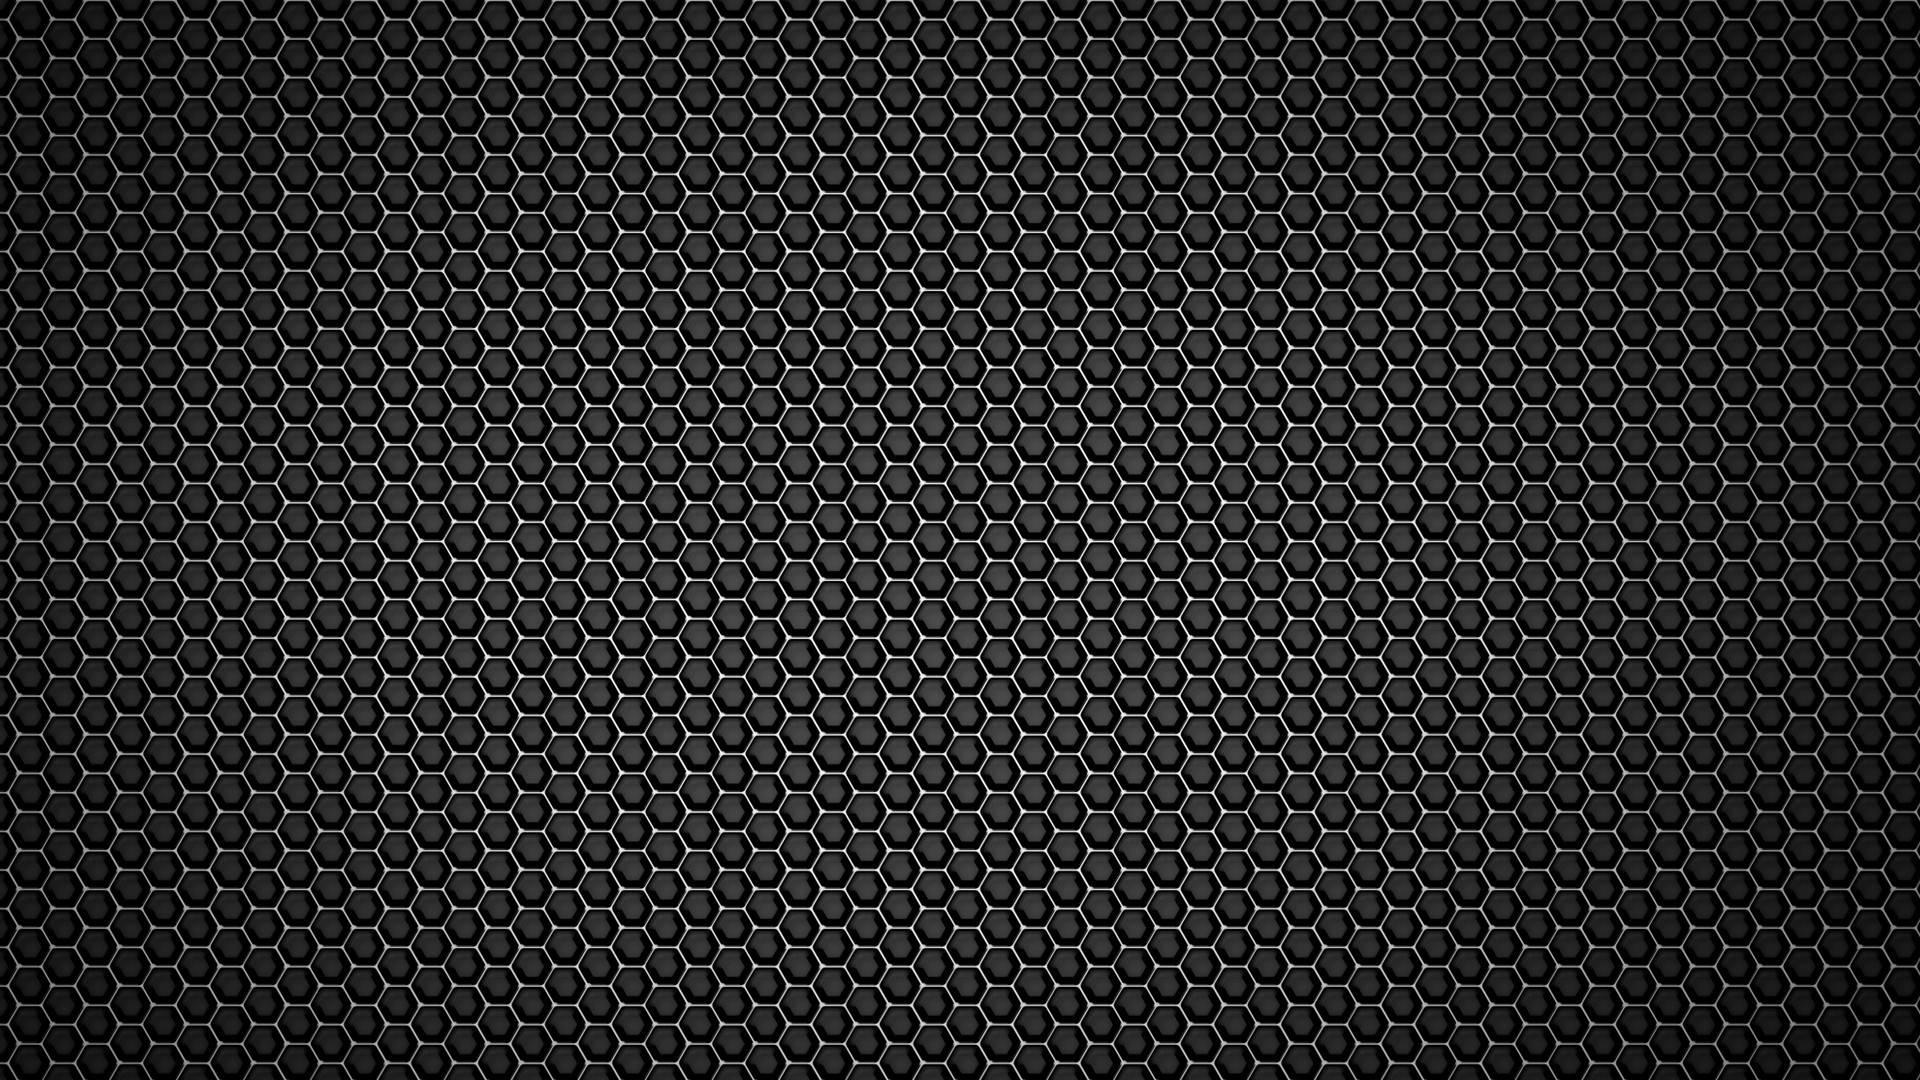 black-1920-1080-wallpaper